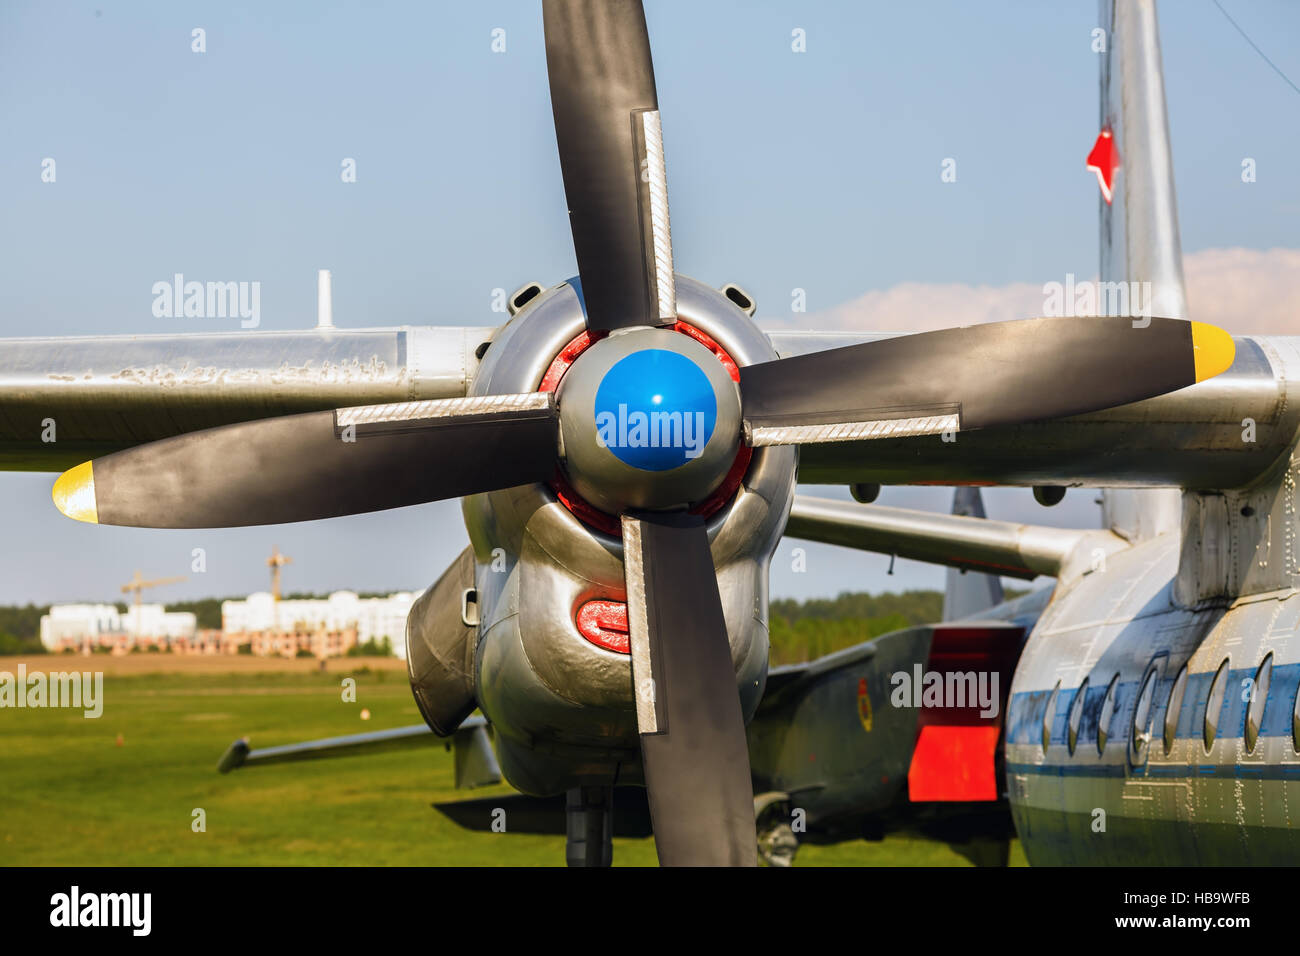 Turboprop transport aircraft - Stock Image